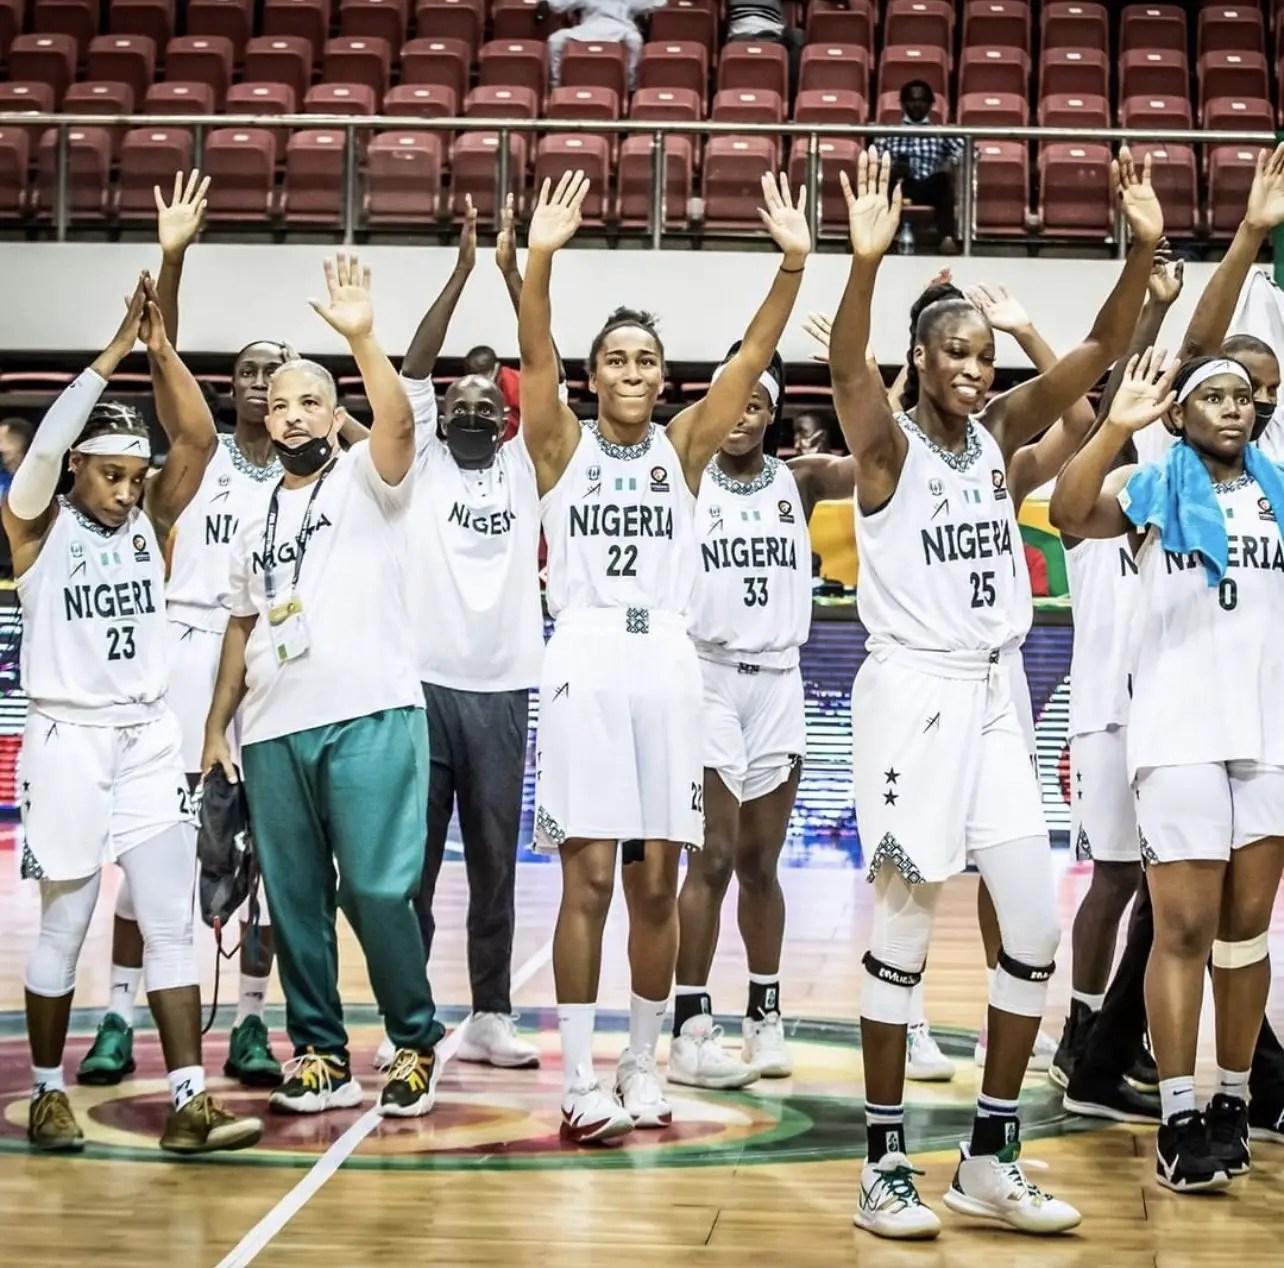 2021 AfroBasket: D'Tigress Defeat Senegal To Qualify For Final